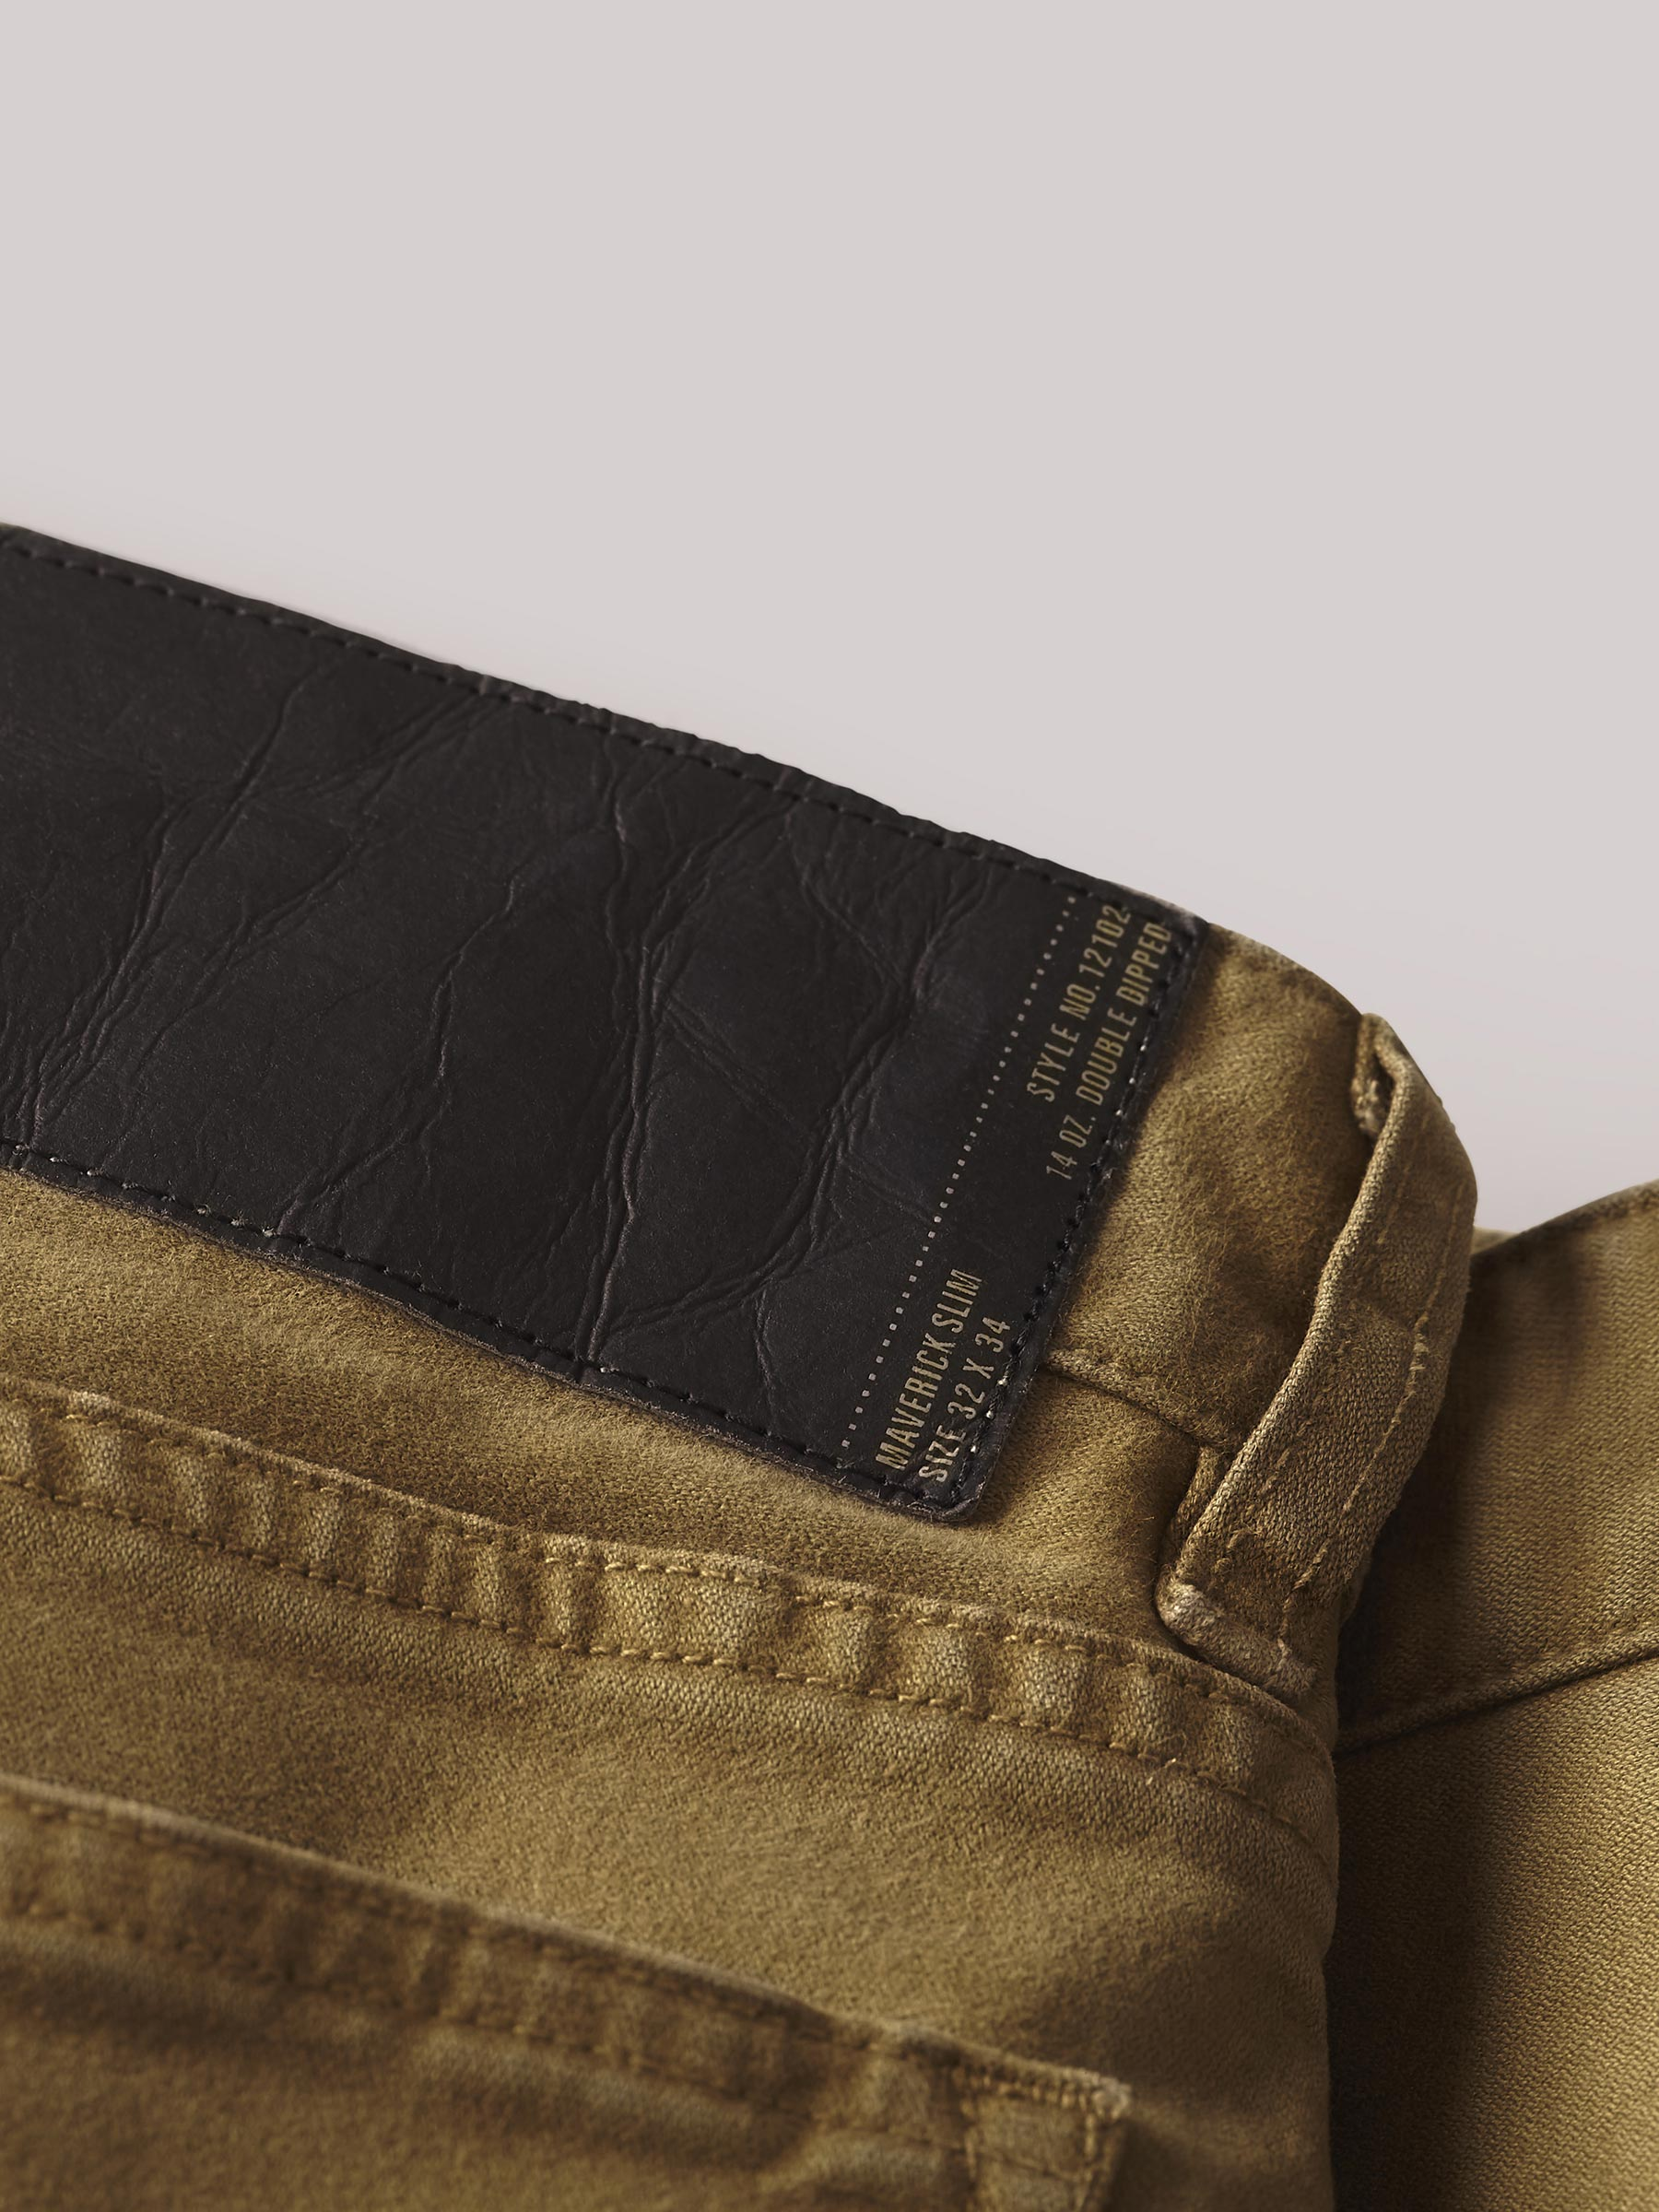 Buck Mason - Navy Harbor Twill Maverick Slim Jean